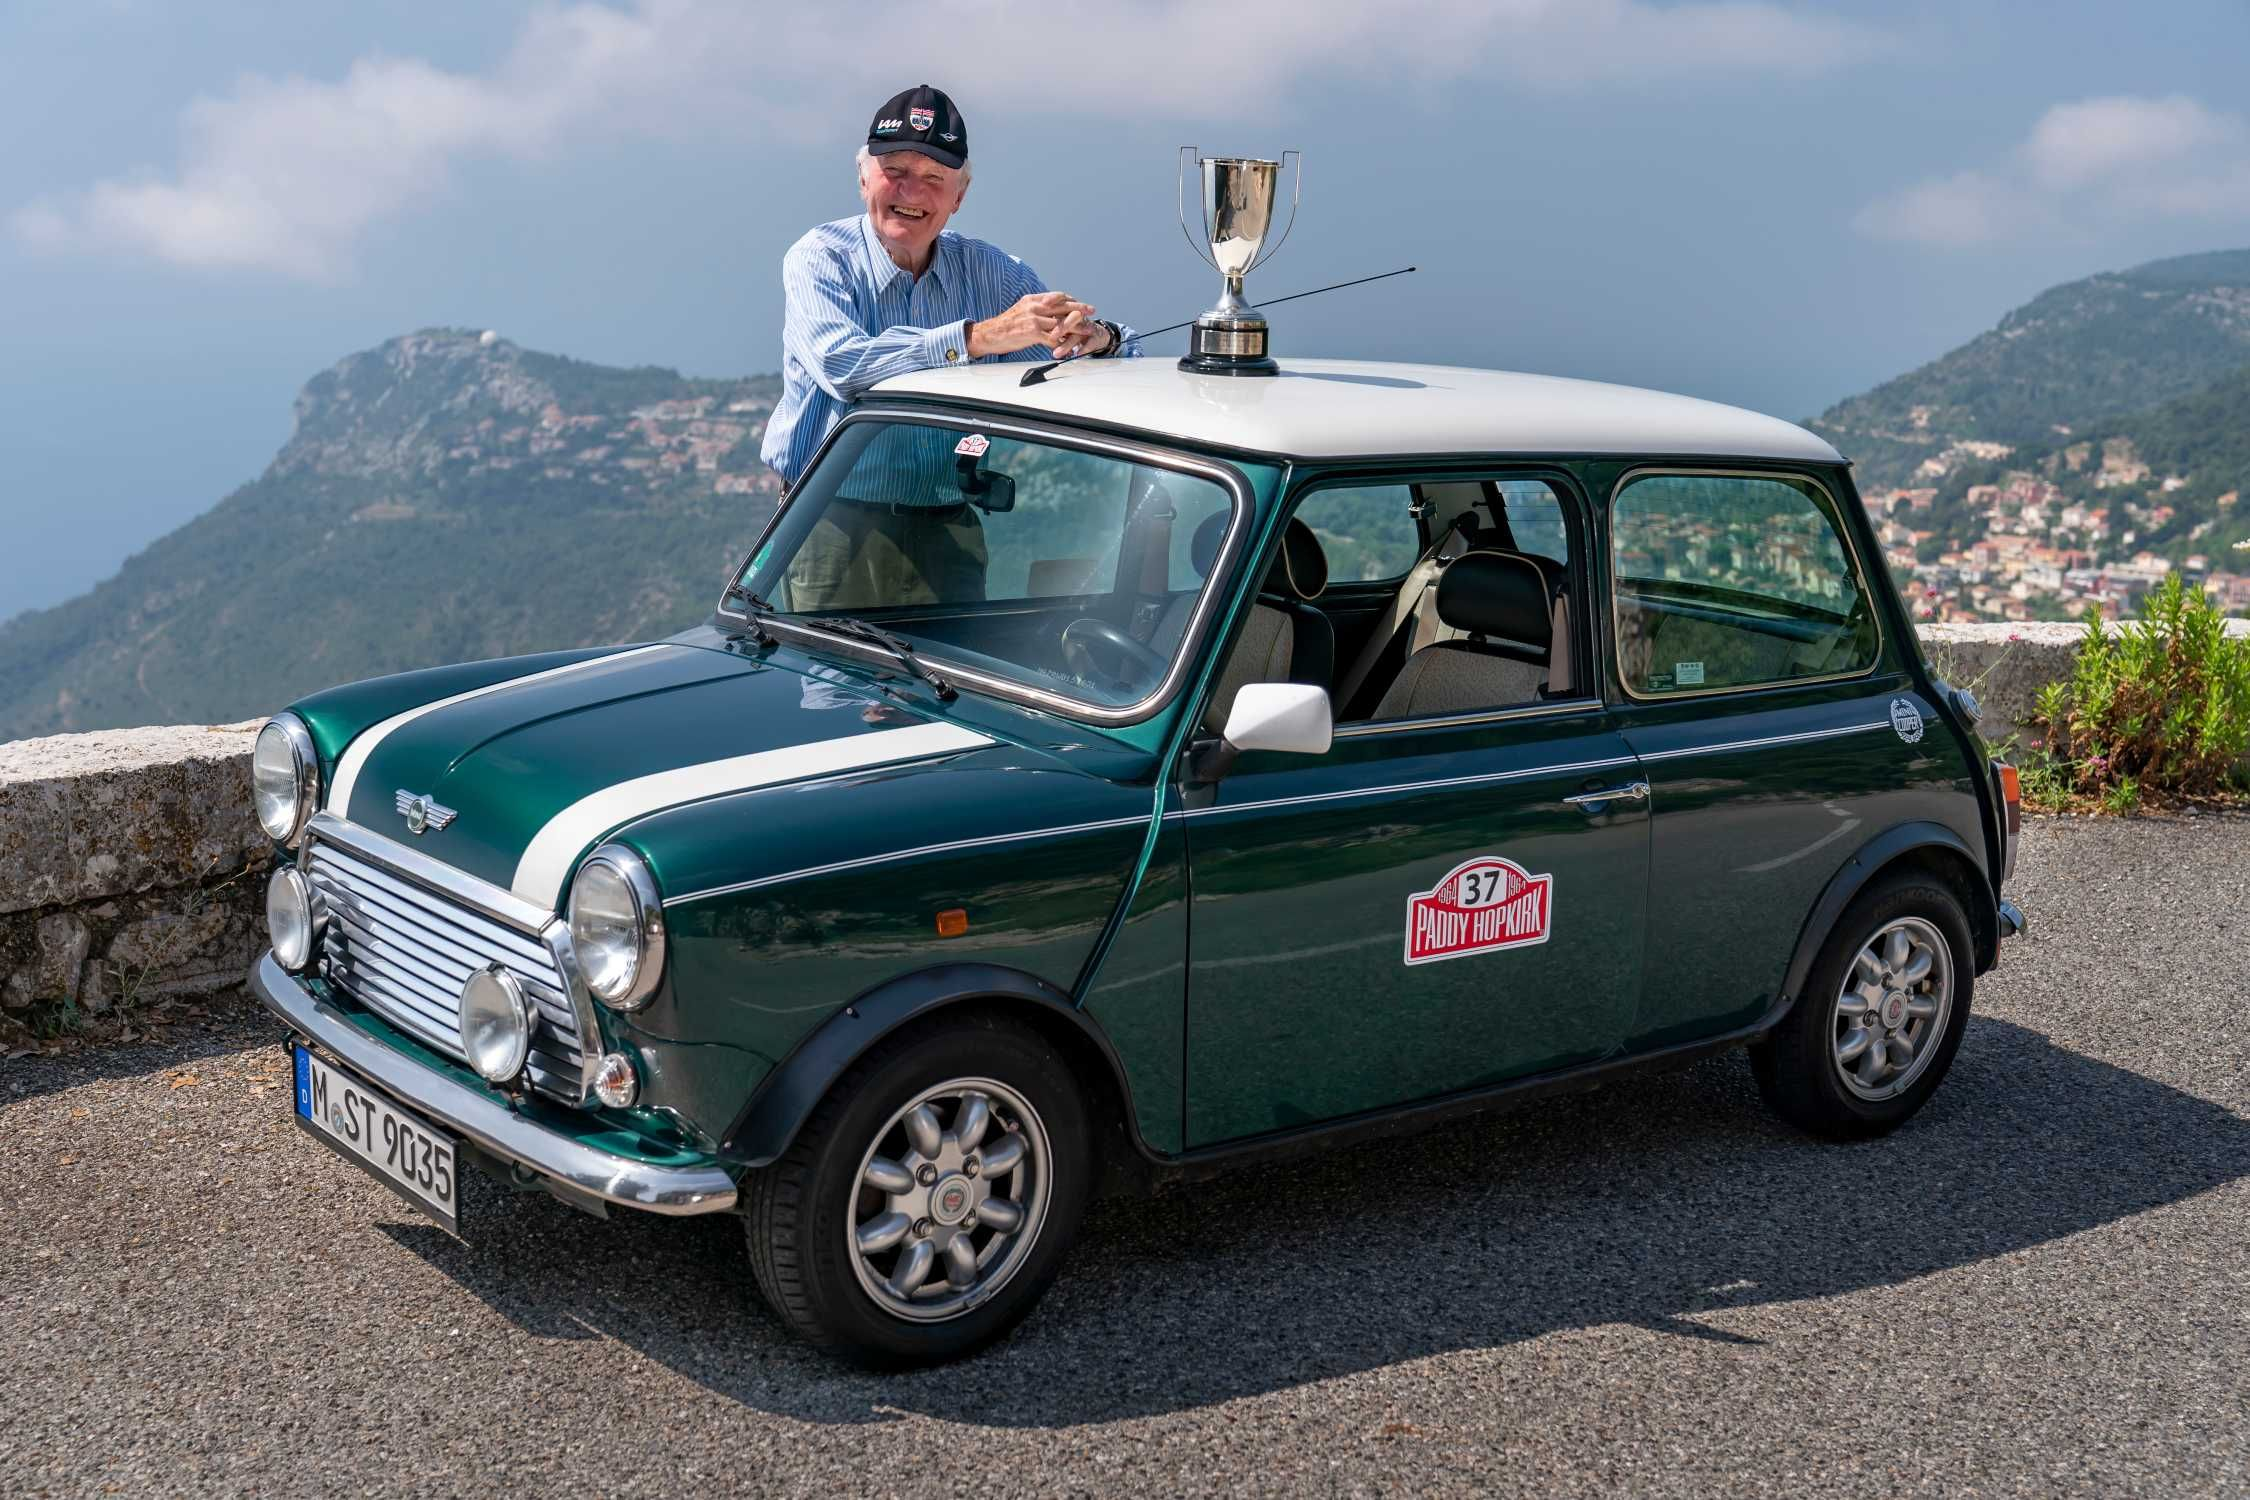 Paddy Hopkirk Gentleman Legend In The Classic Mini And Fifth Beatle Https Ift Tt 32lnduw Classic Mini Monte Carlo Mini Cooper S